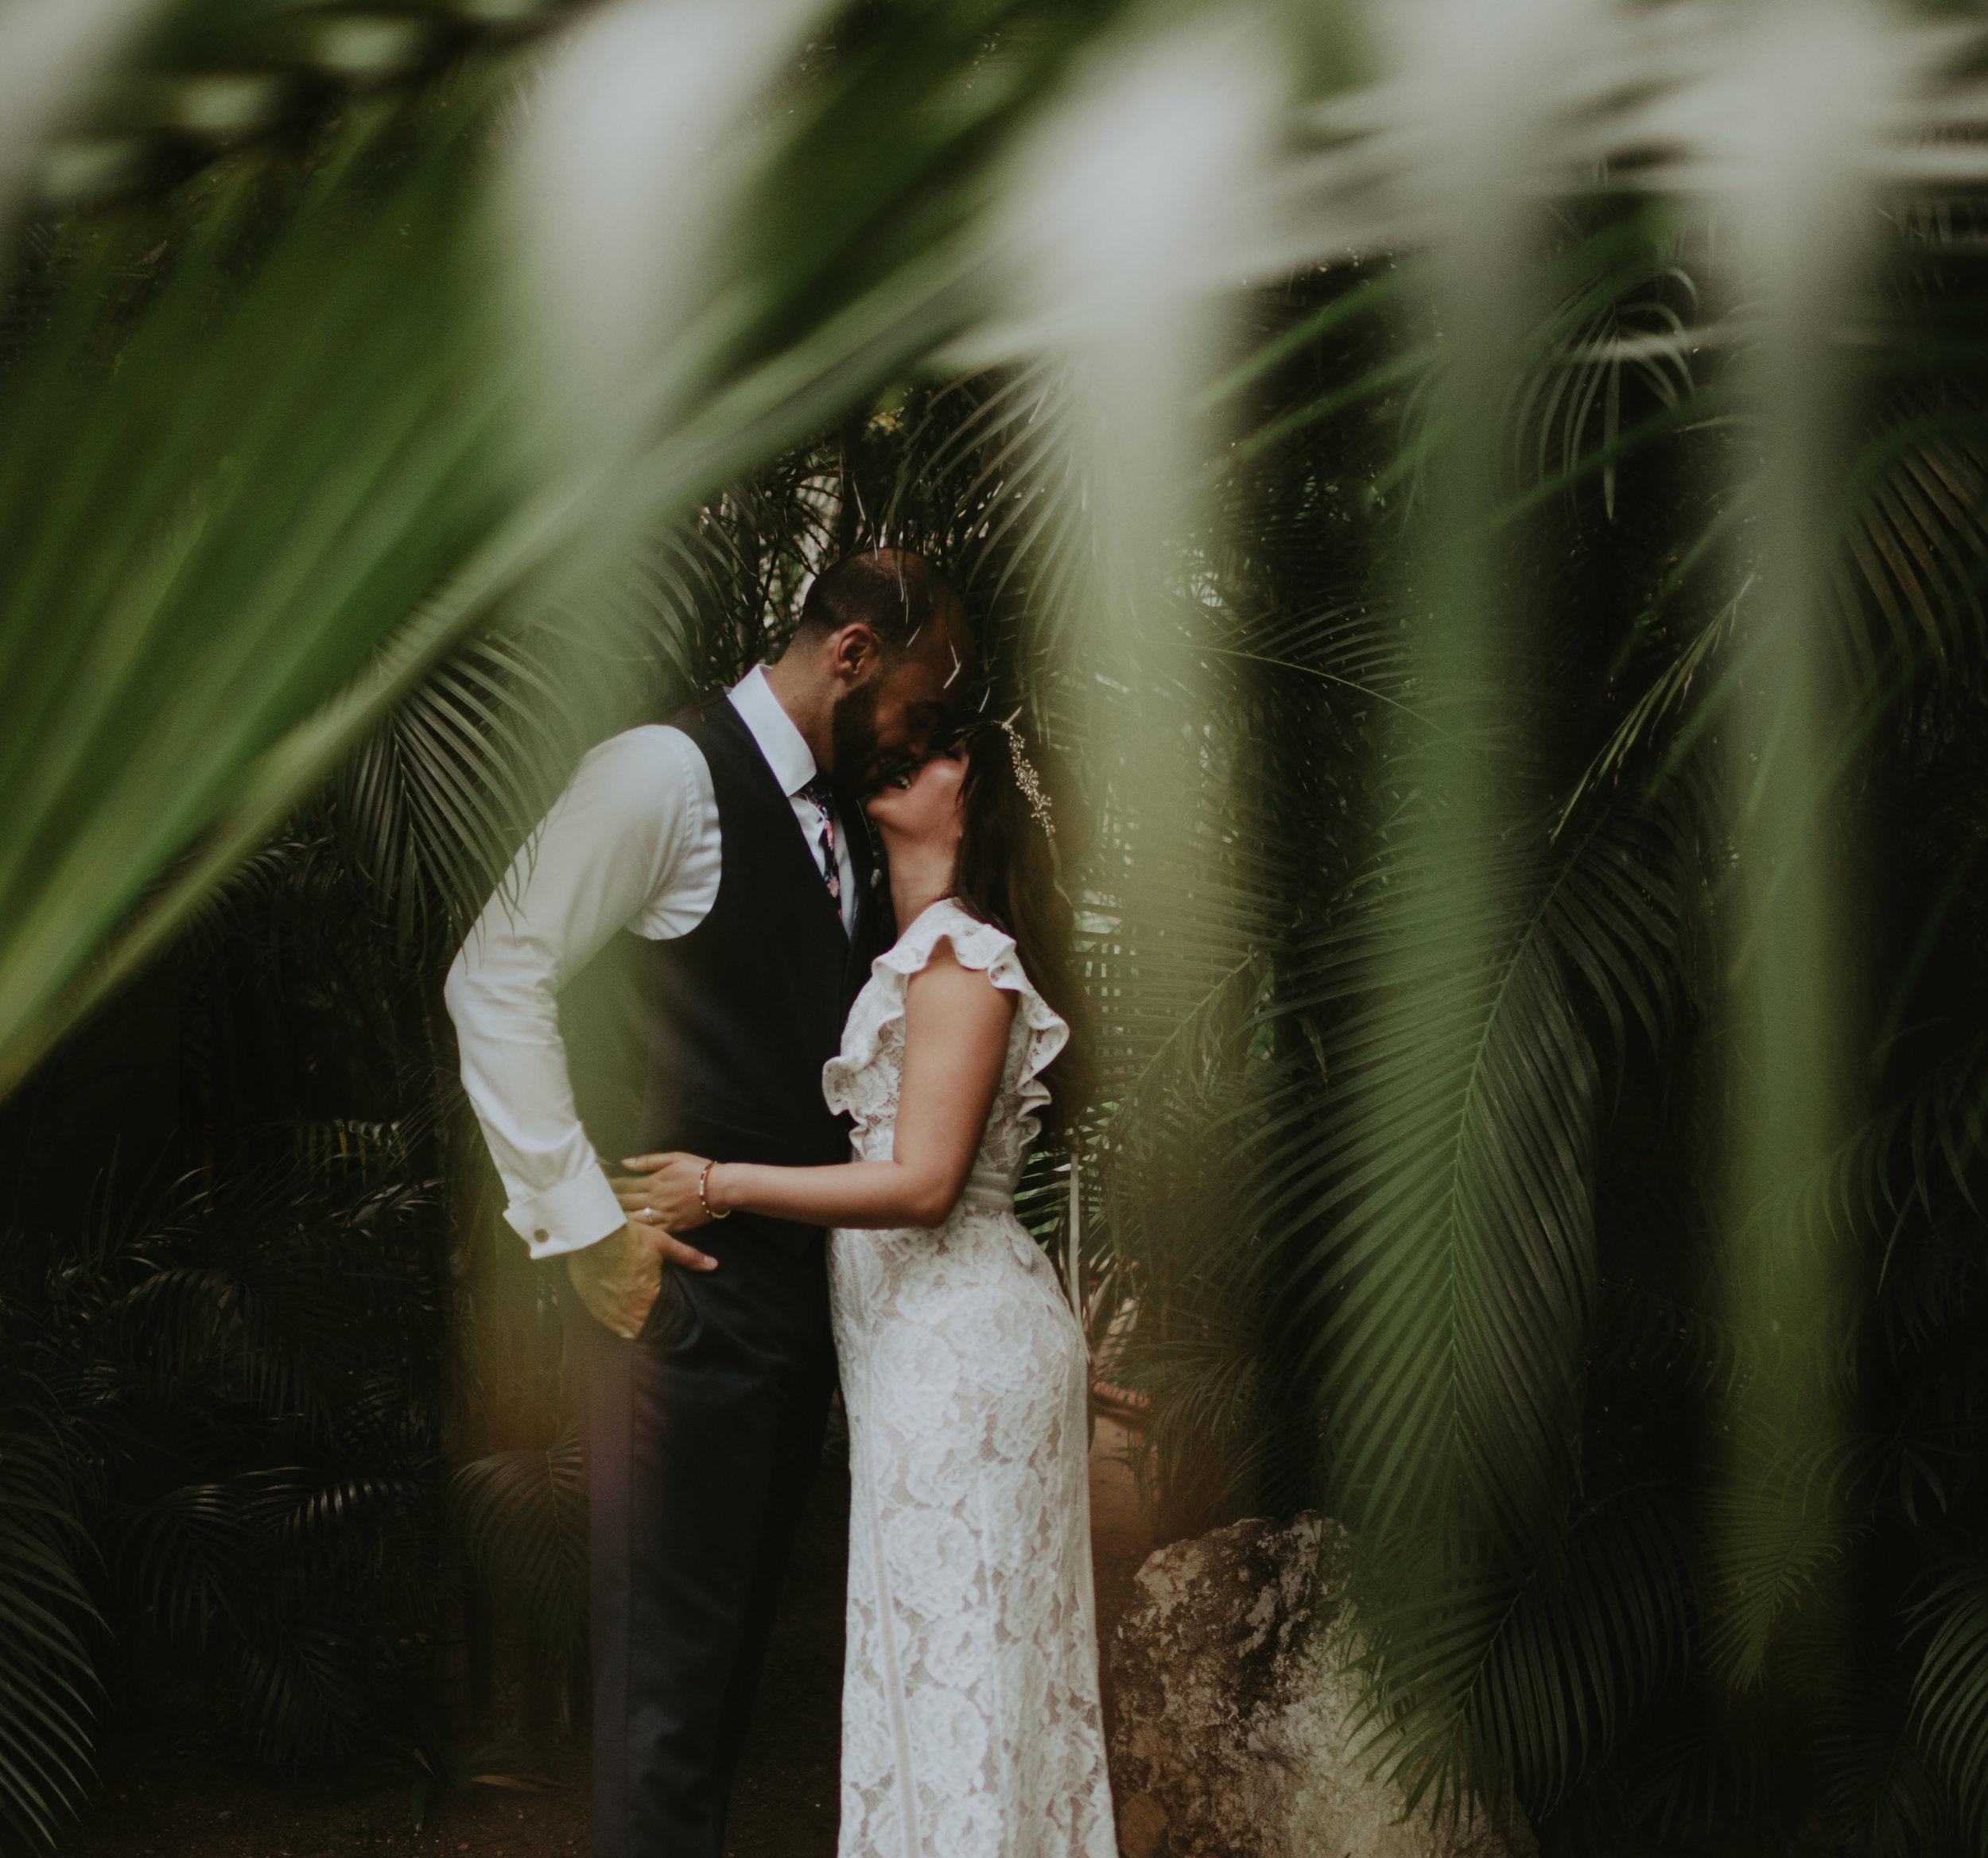 VILLA DEL PALMAR CANCUN WEDDING-THY-BRAN-JENNY CHOK PHOTOIMG_0263.jpg